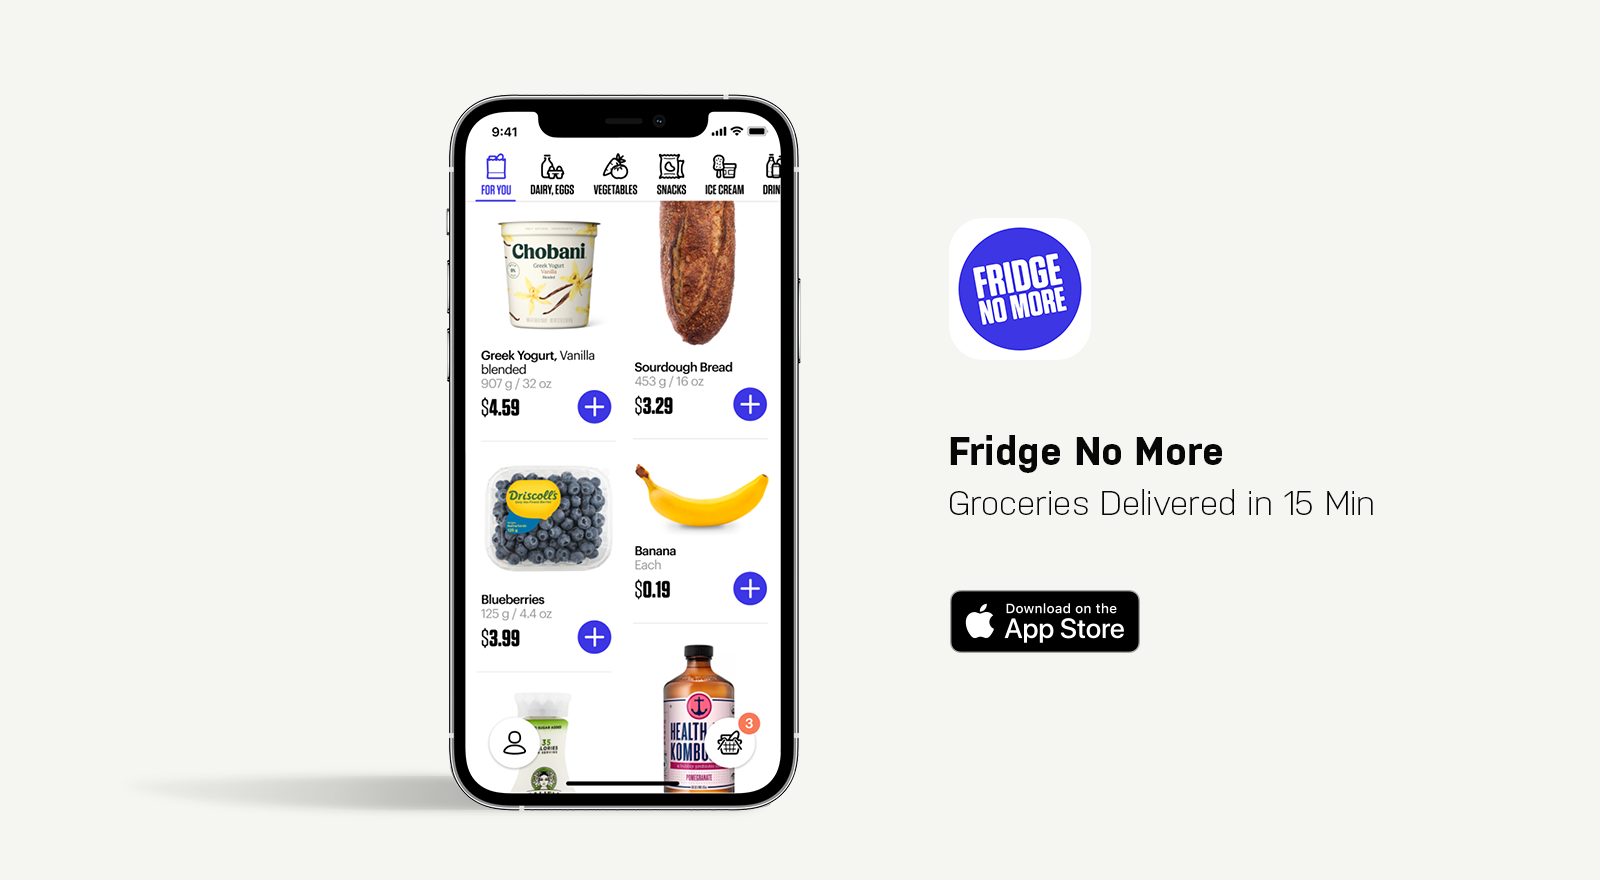 fridge no more app